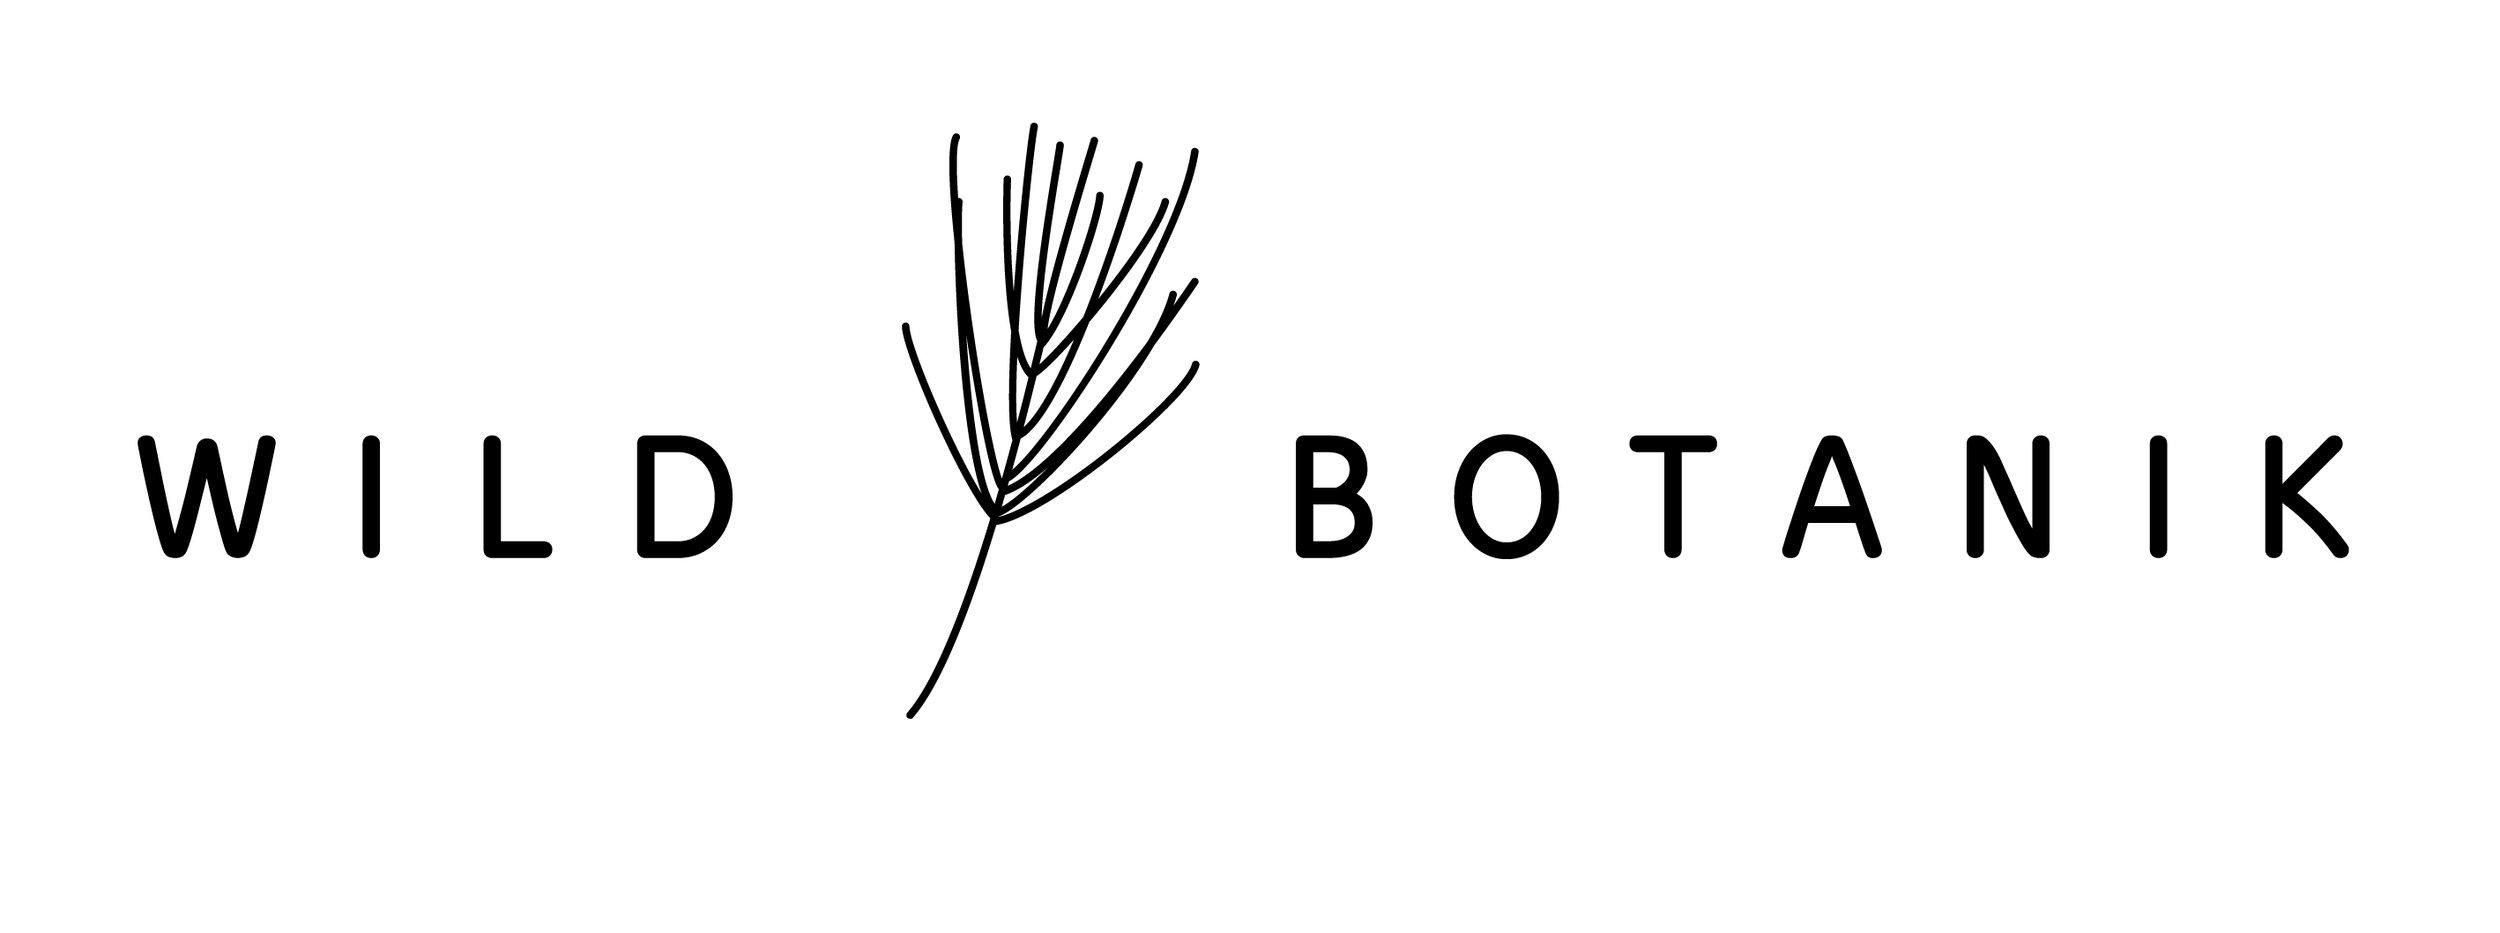 WildBotanik_Logo.jpg